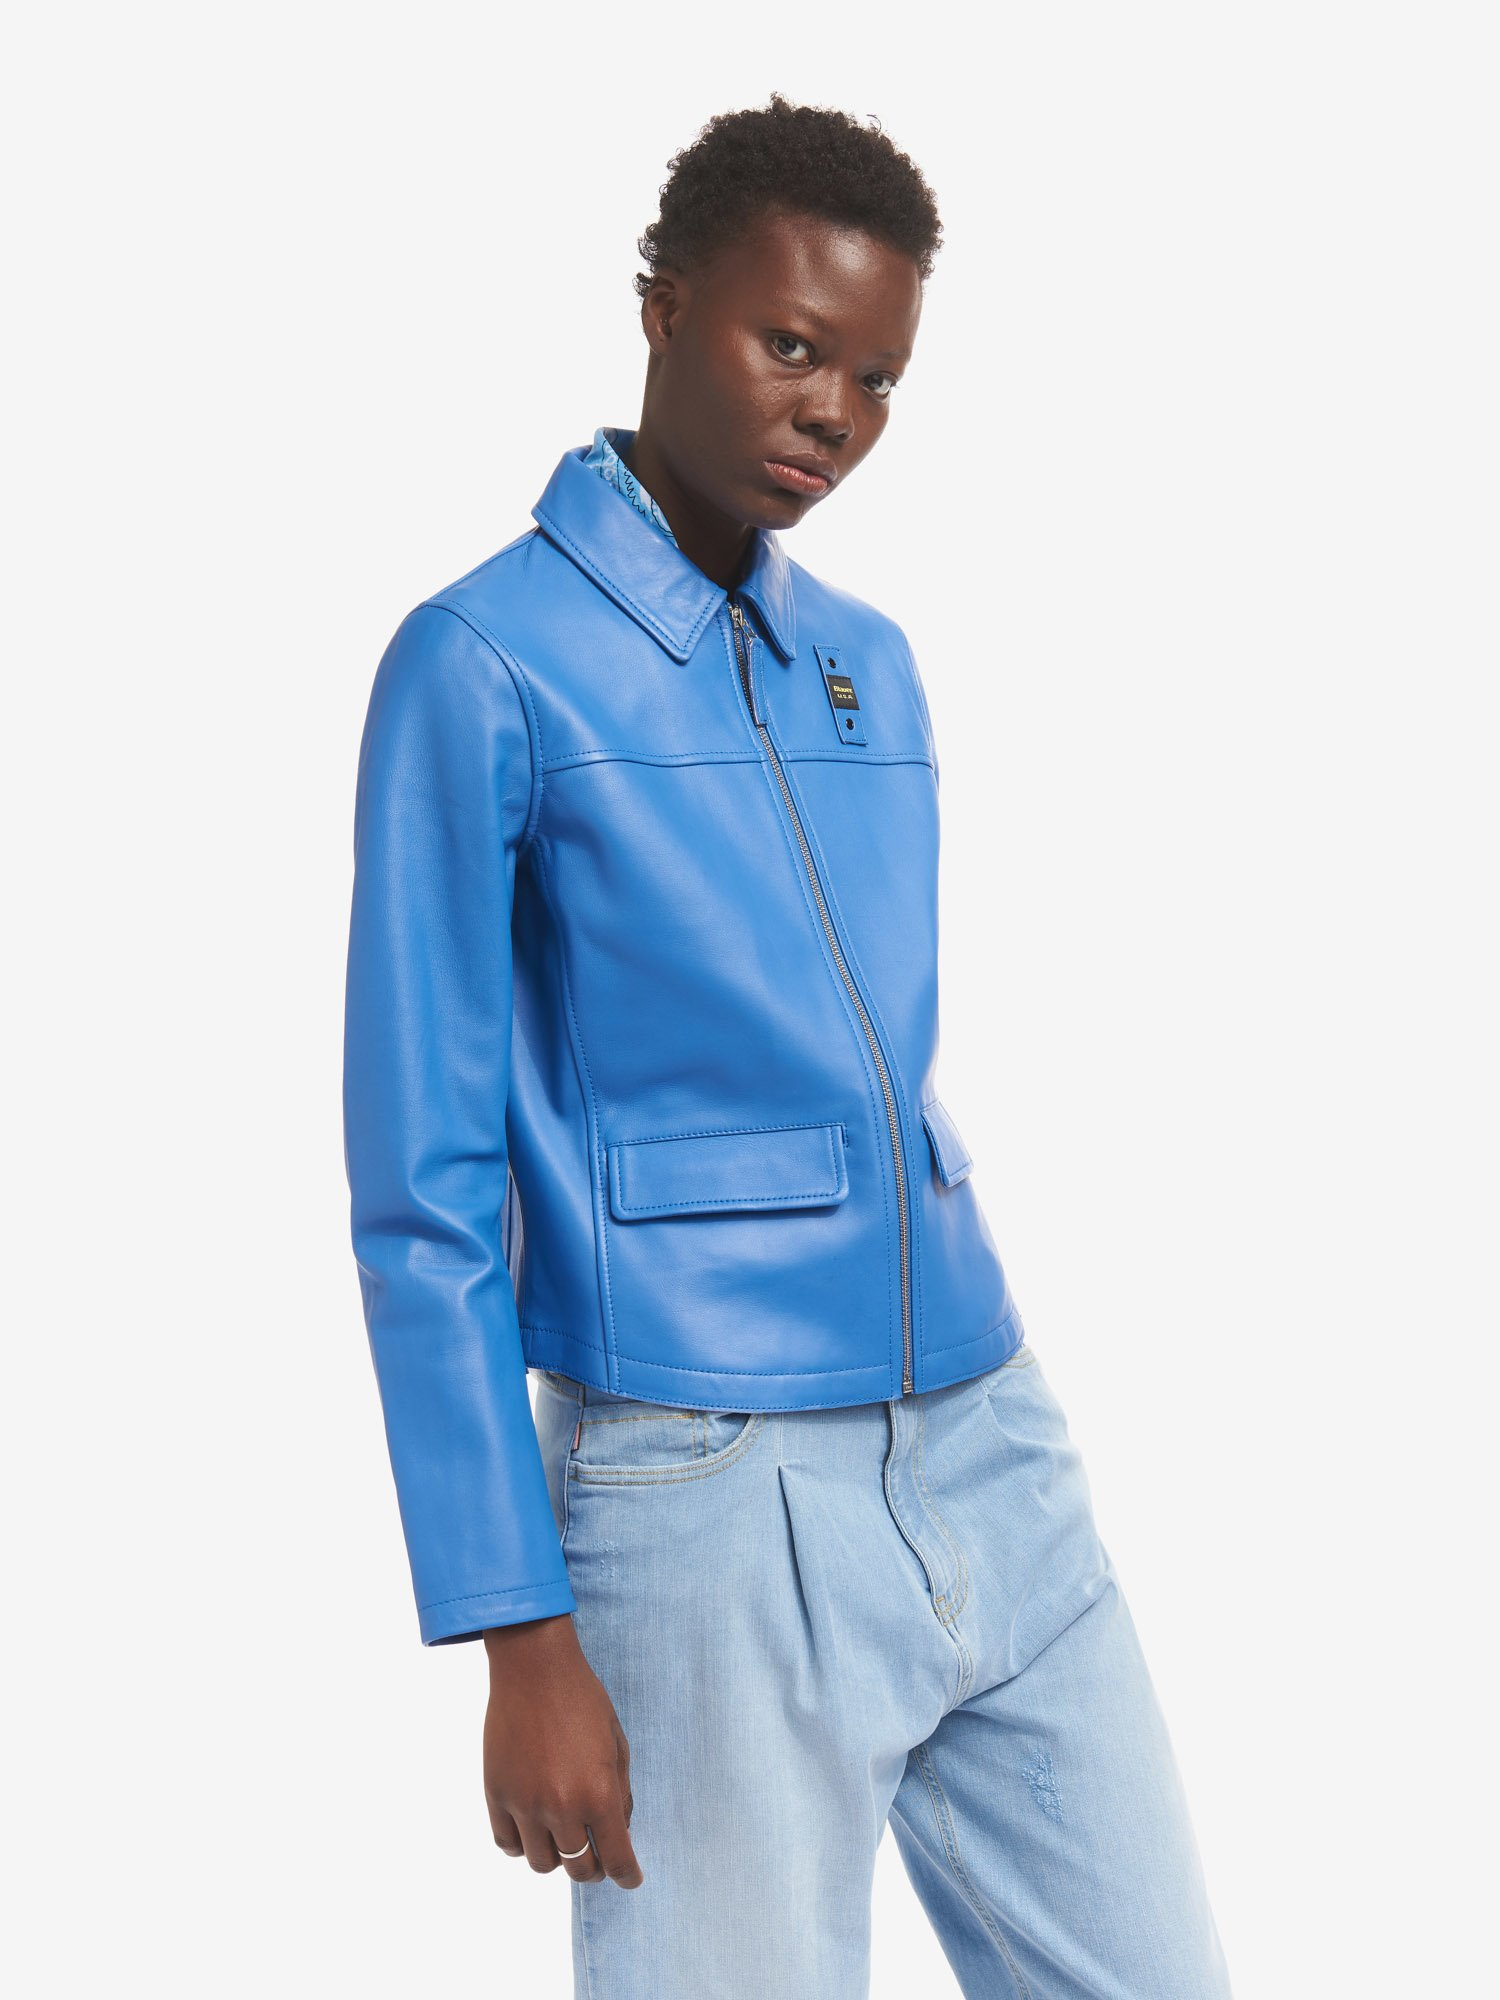 Blauer - КОЖАНАЯ КУРТКА БЕЗ ПОДКЛАДКИ SHERRY - Light Sapphire Blue - Blauer